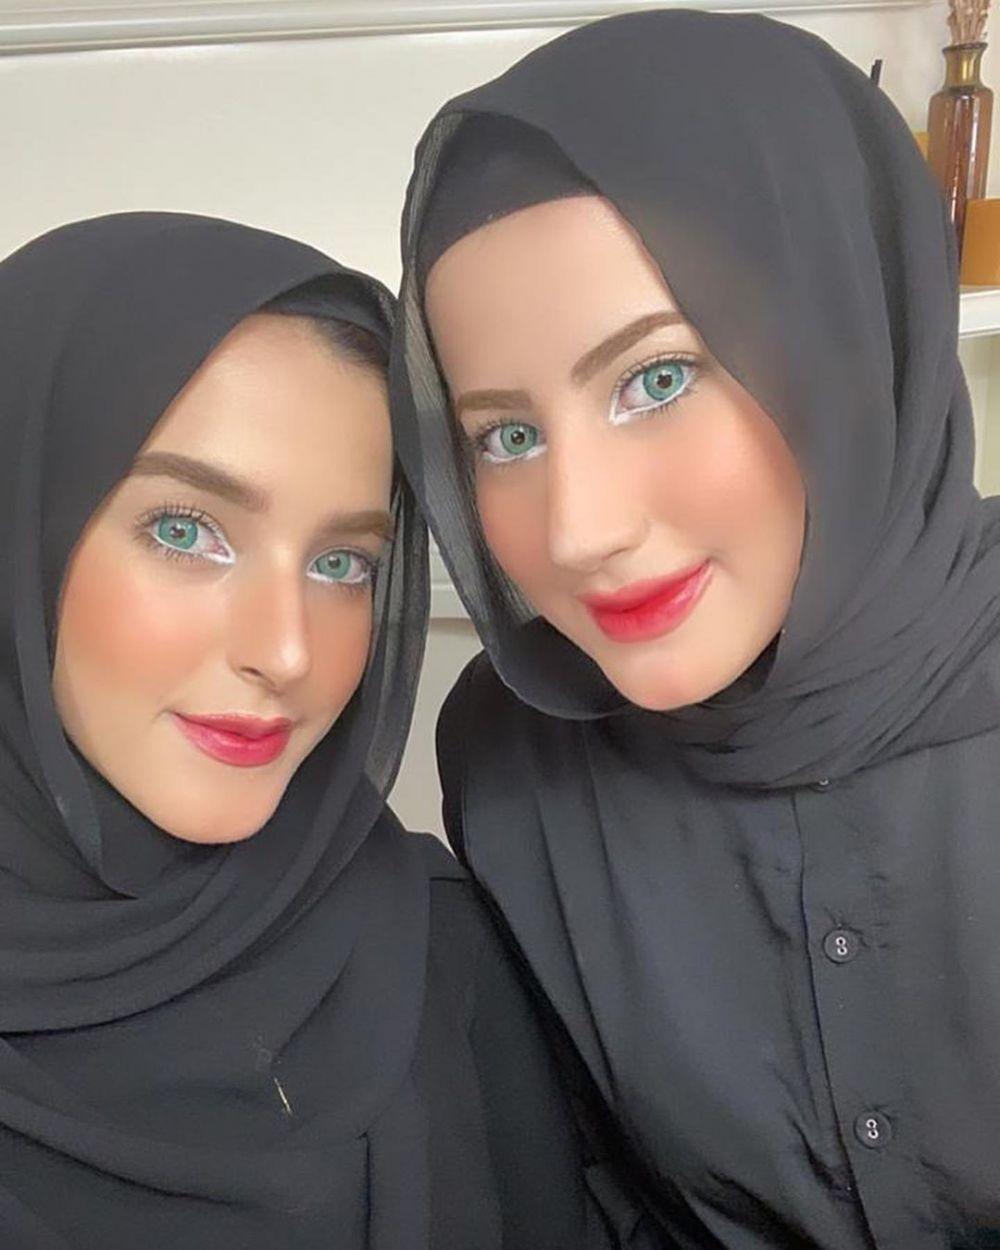 selebgram cantik bareng kembarannya © 2020 Instagram